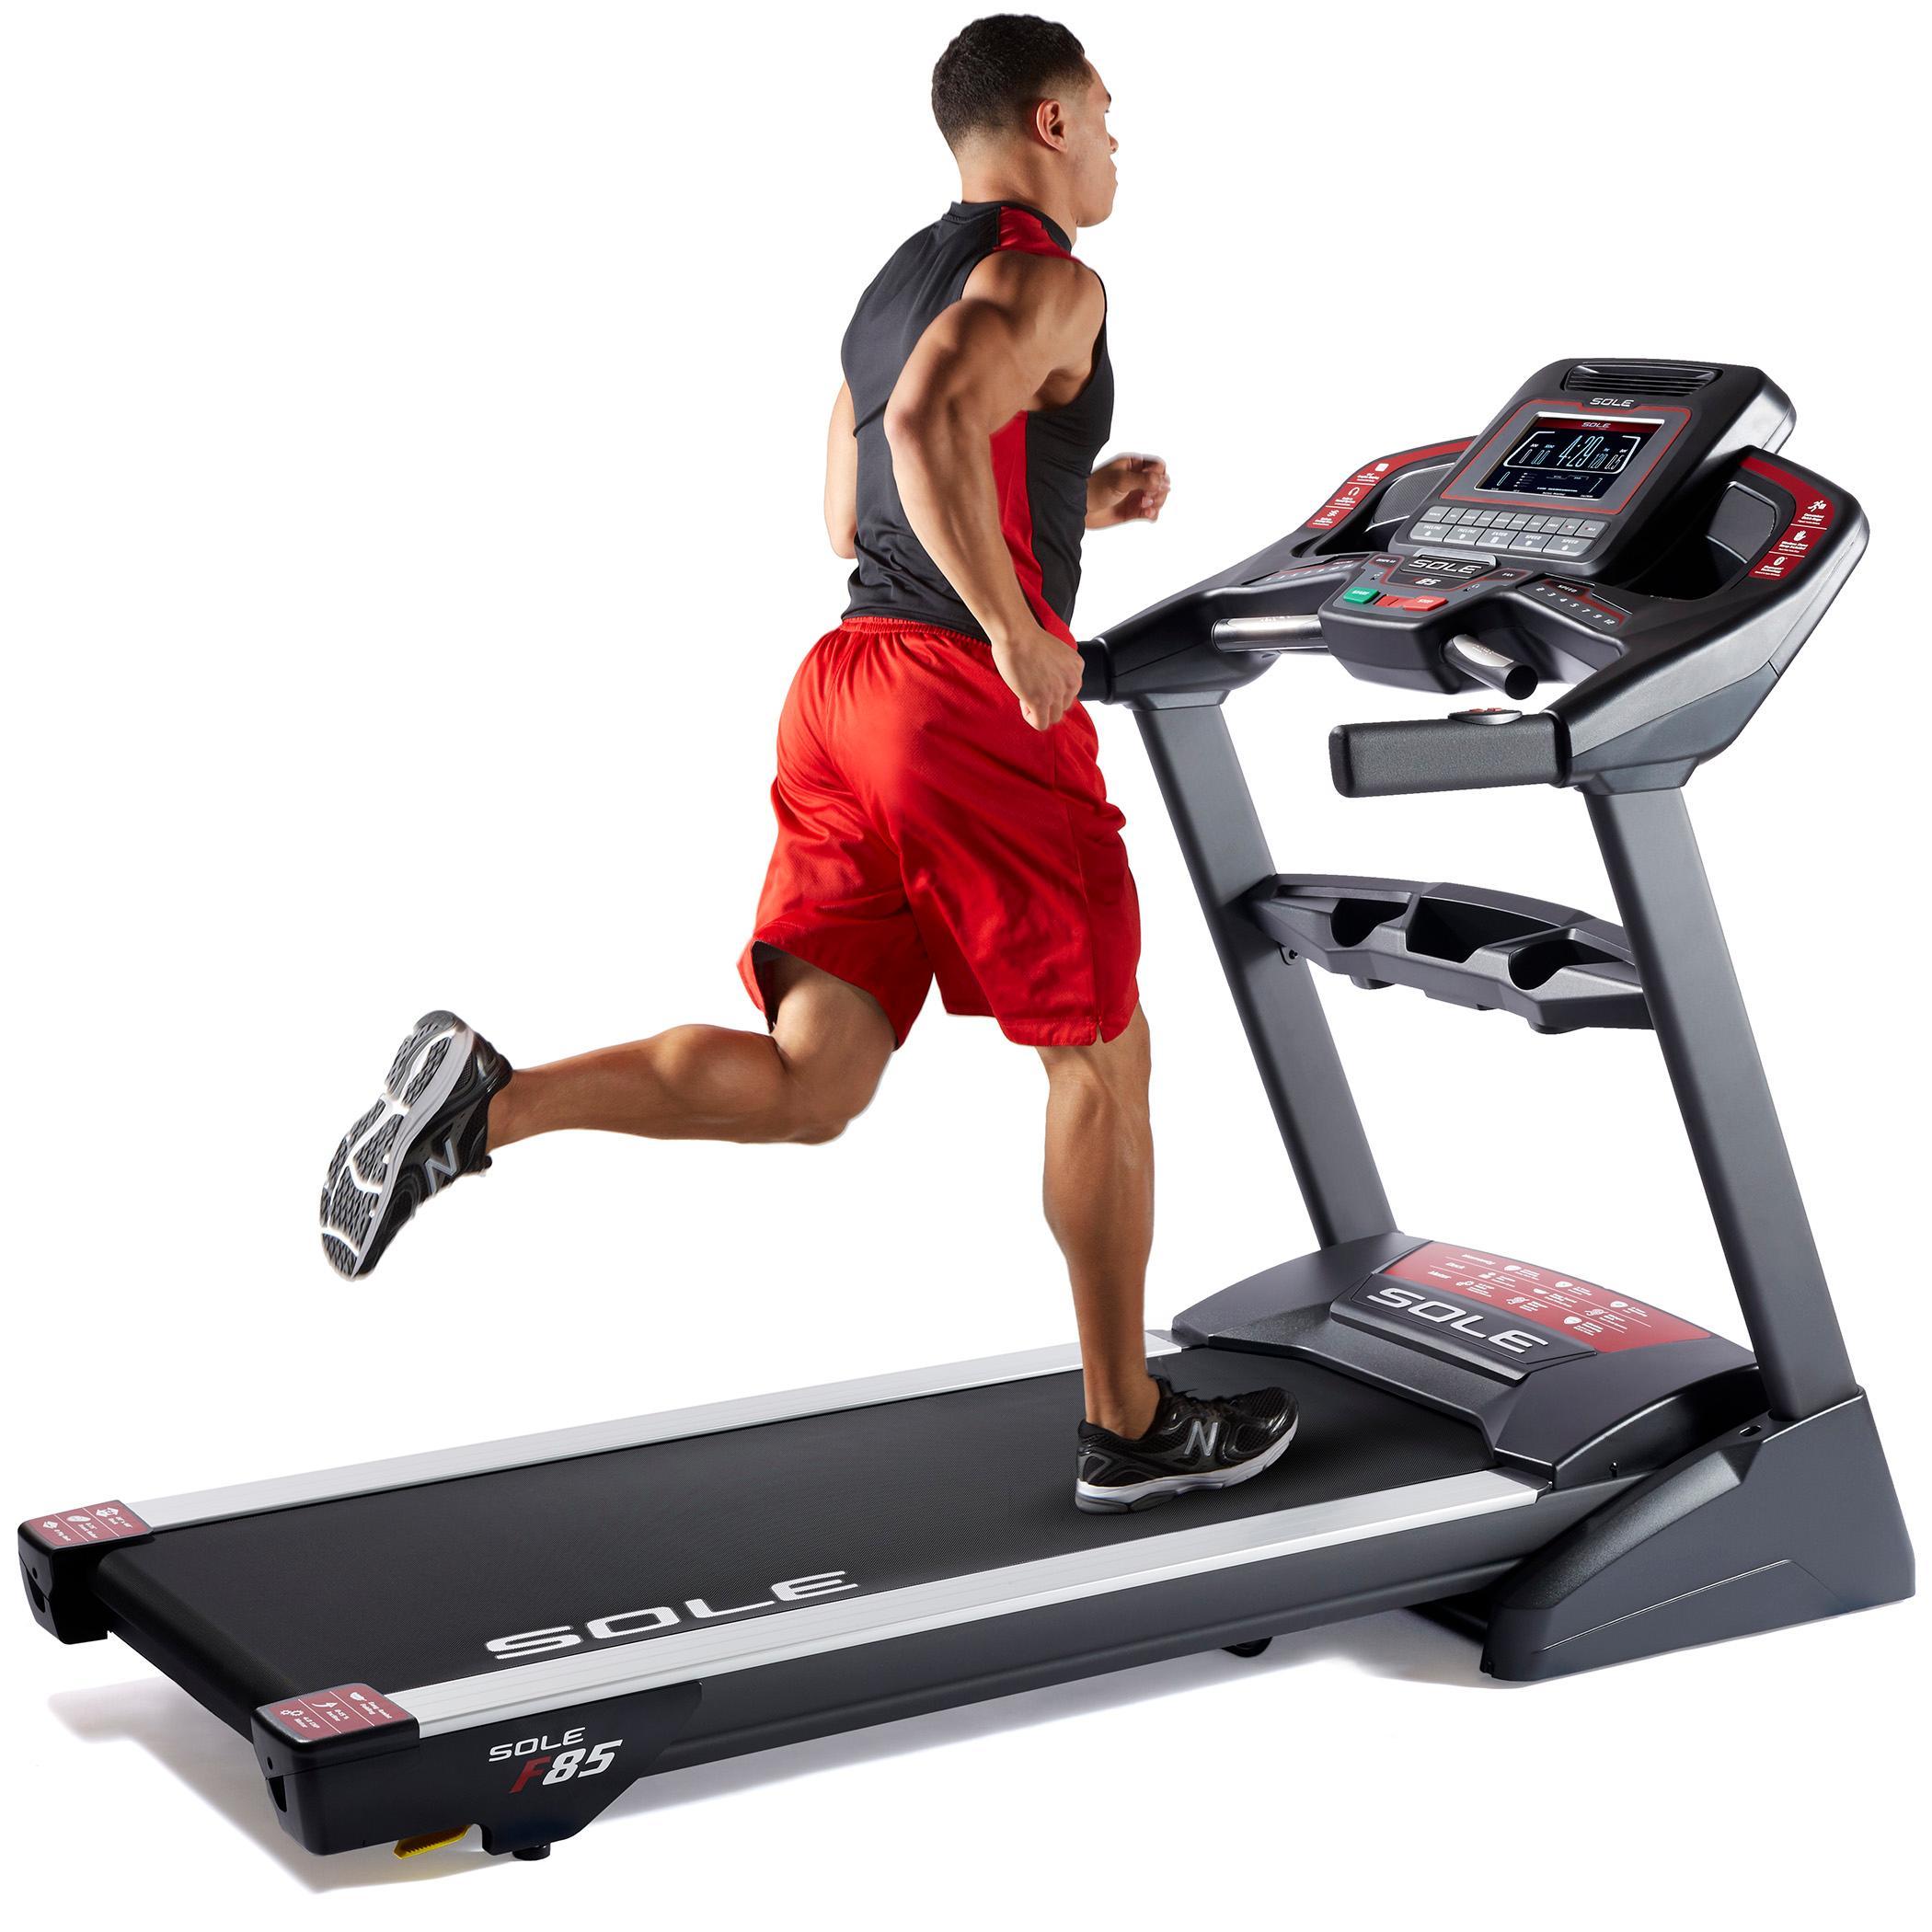 Life Fitness Treadmill Deck Replacement: SOLE Fitness F85 Folding Treadmill Machine